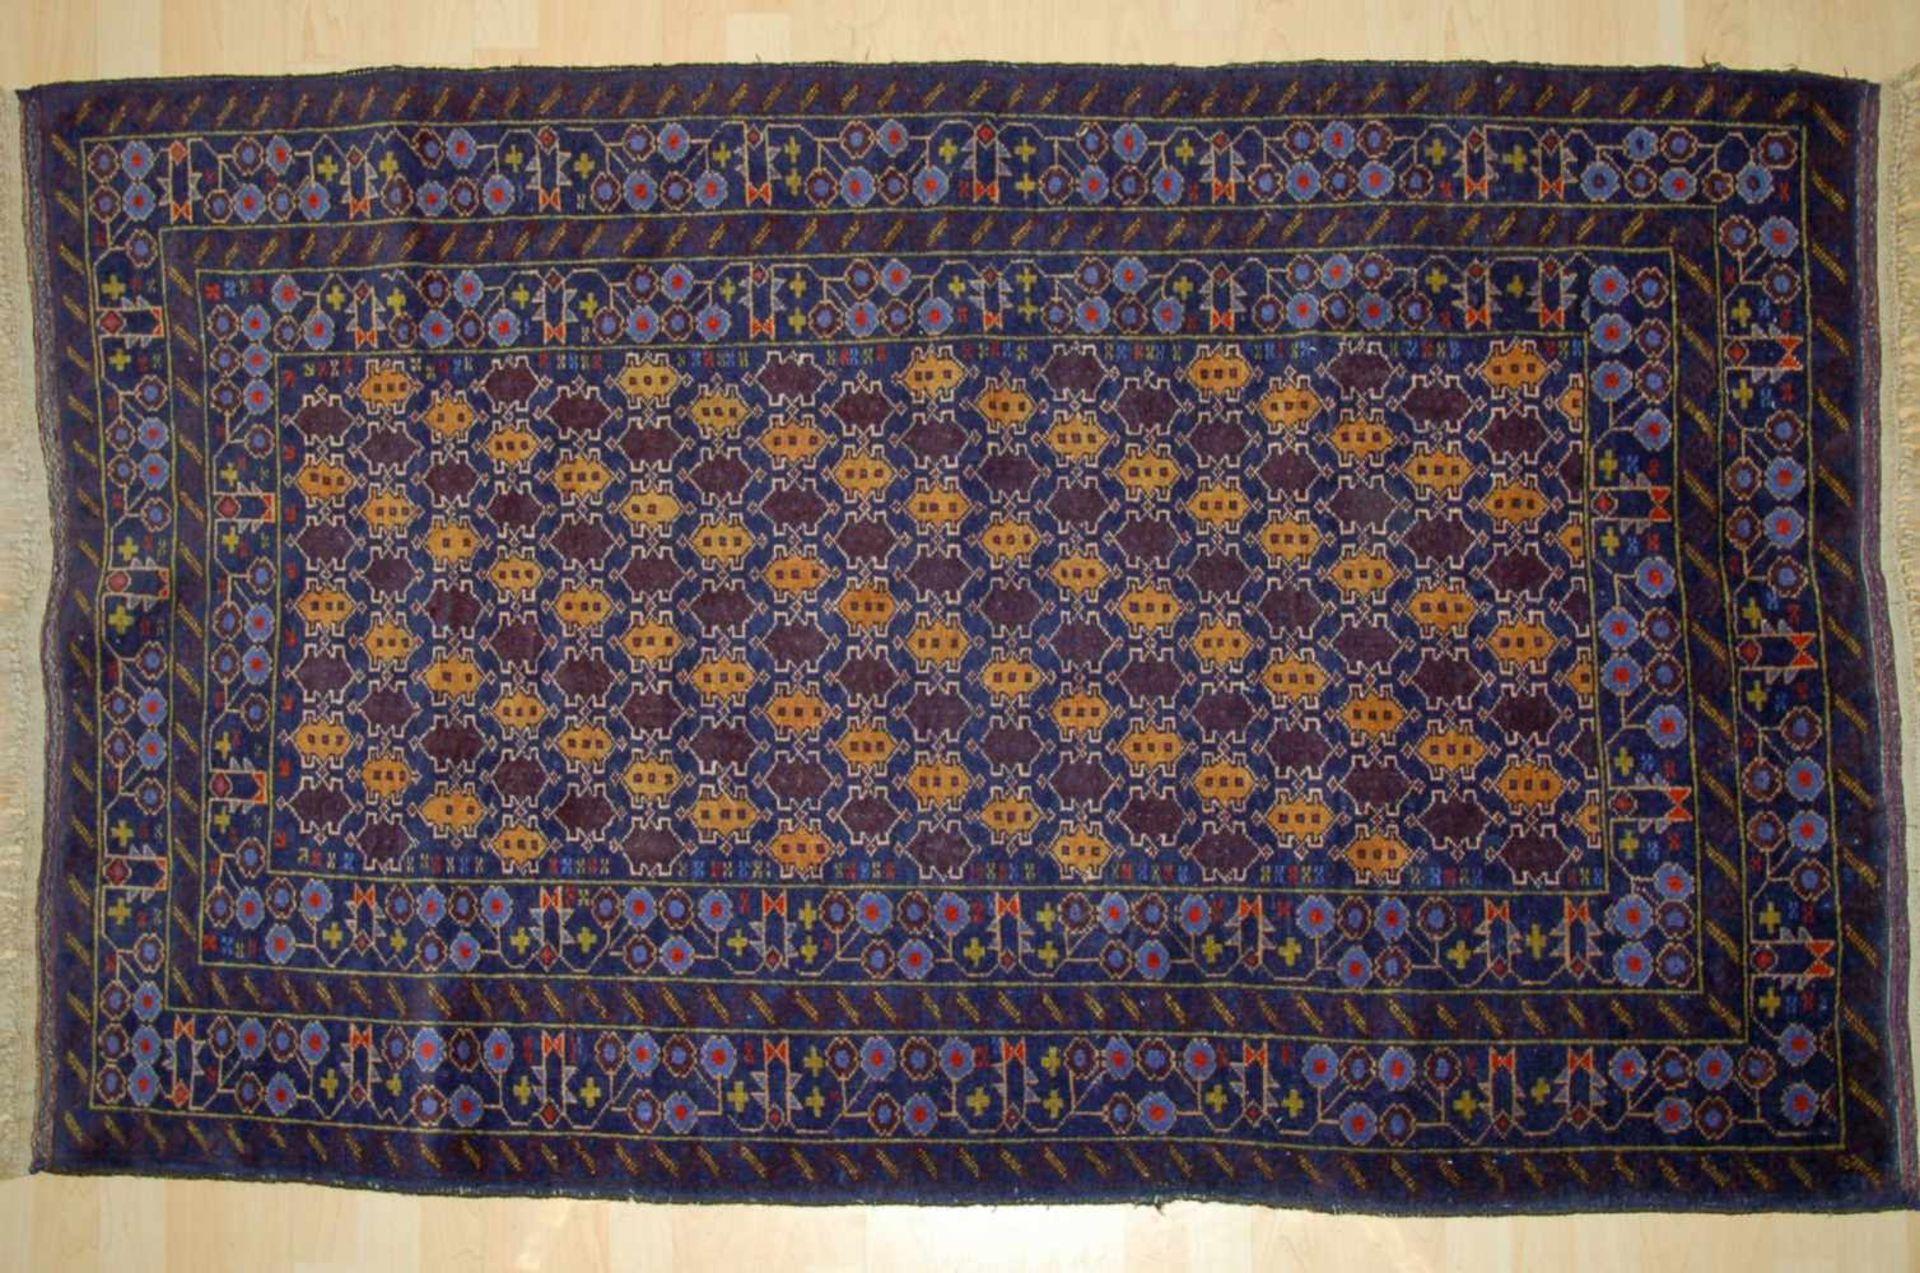 Bouchara, ZentralasienBrücke, blaugrundig, ca. 185 x 106 cm.